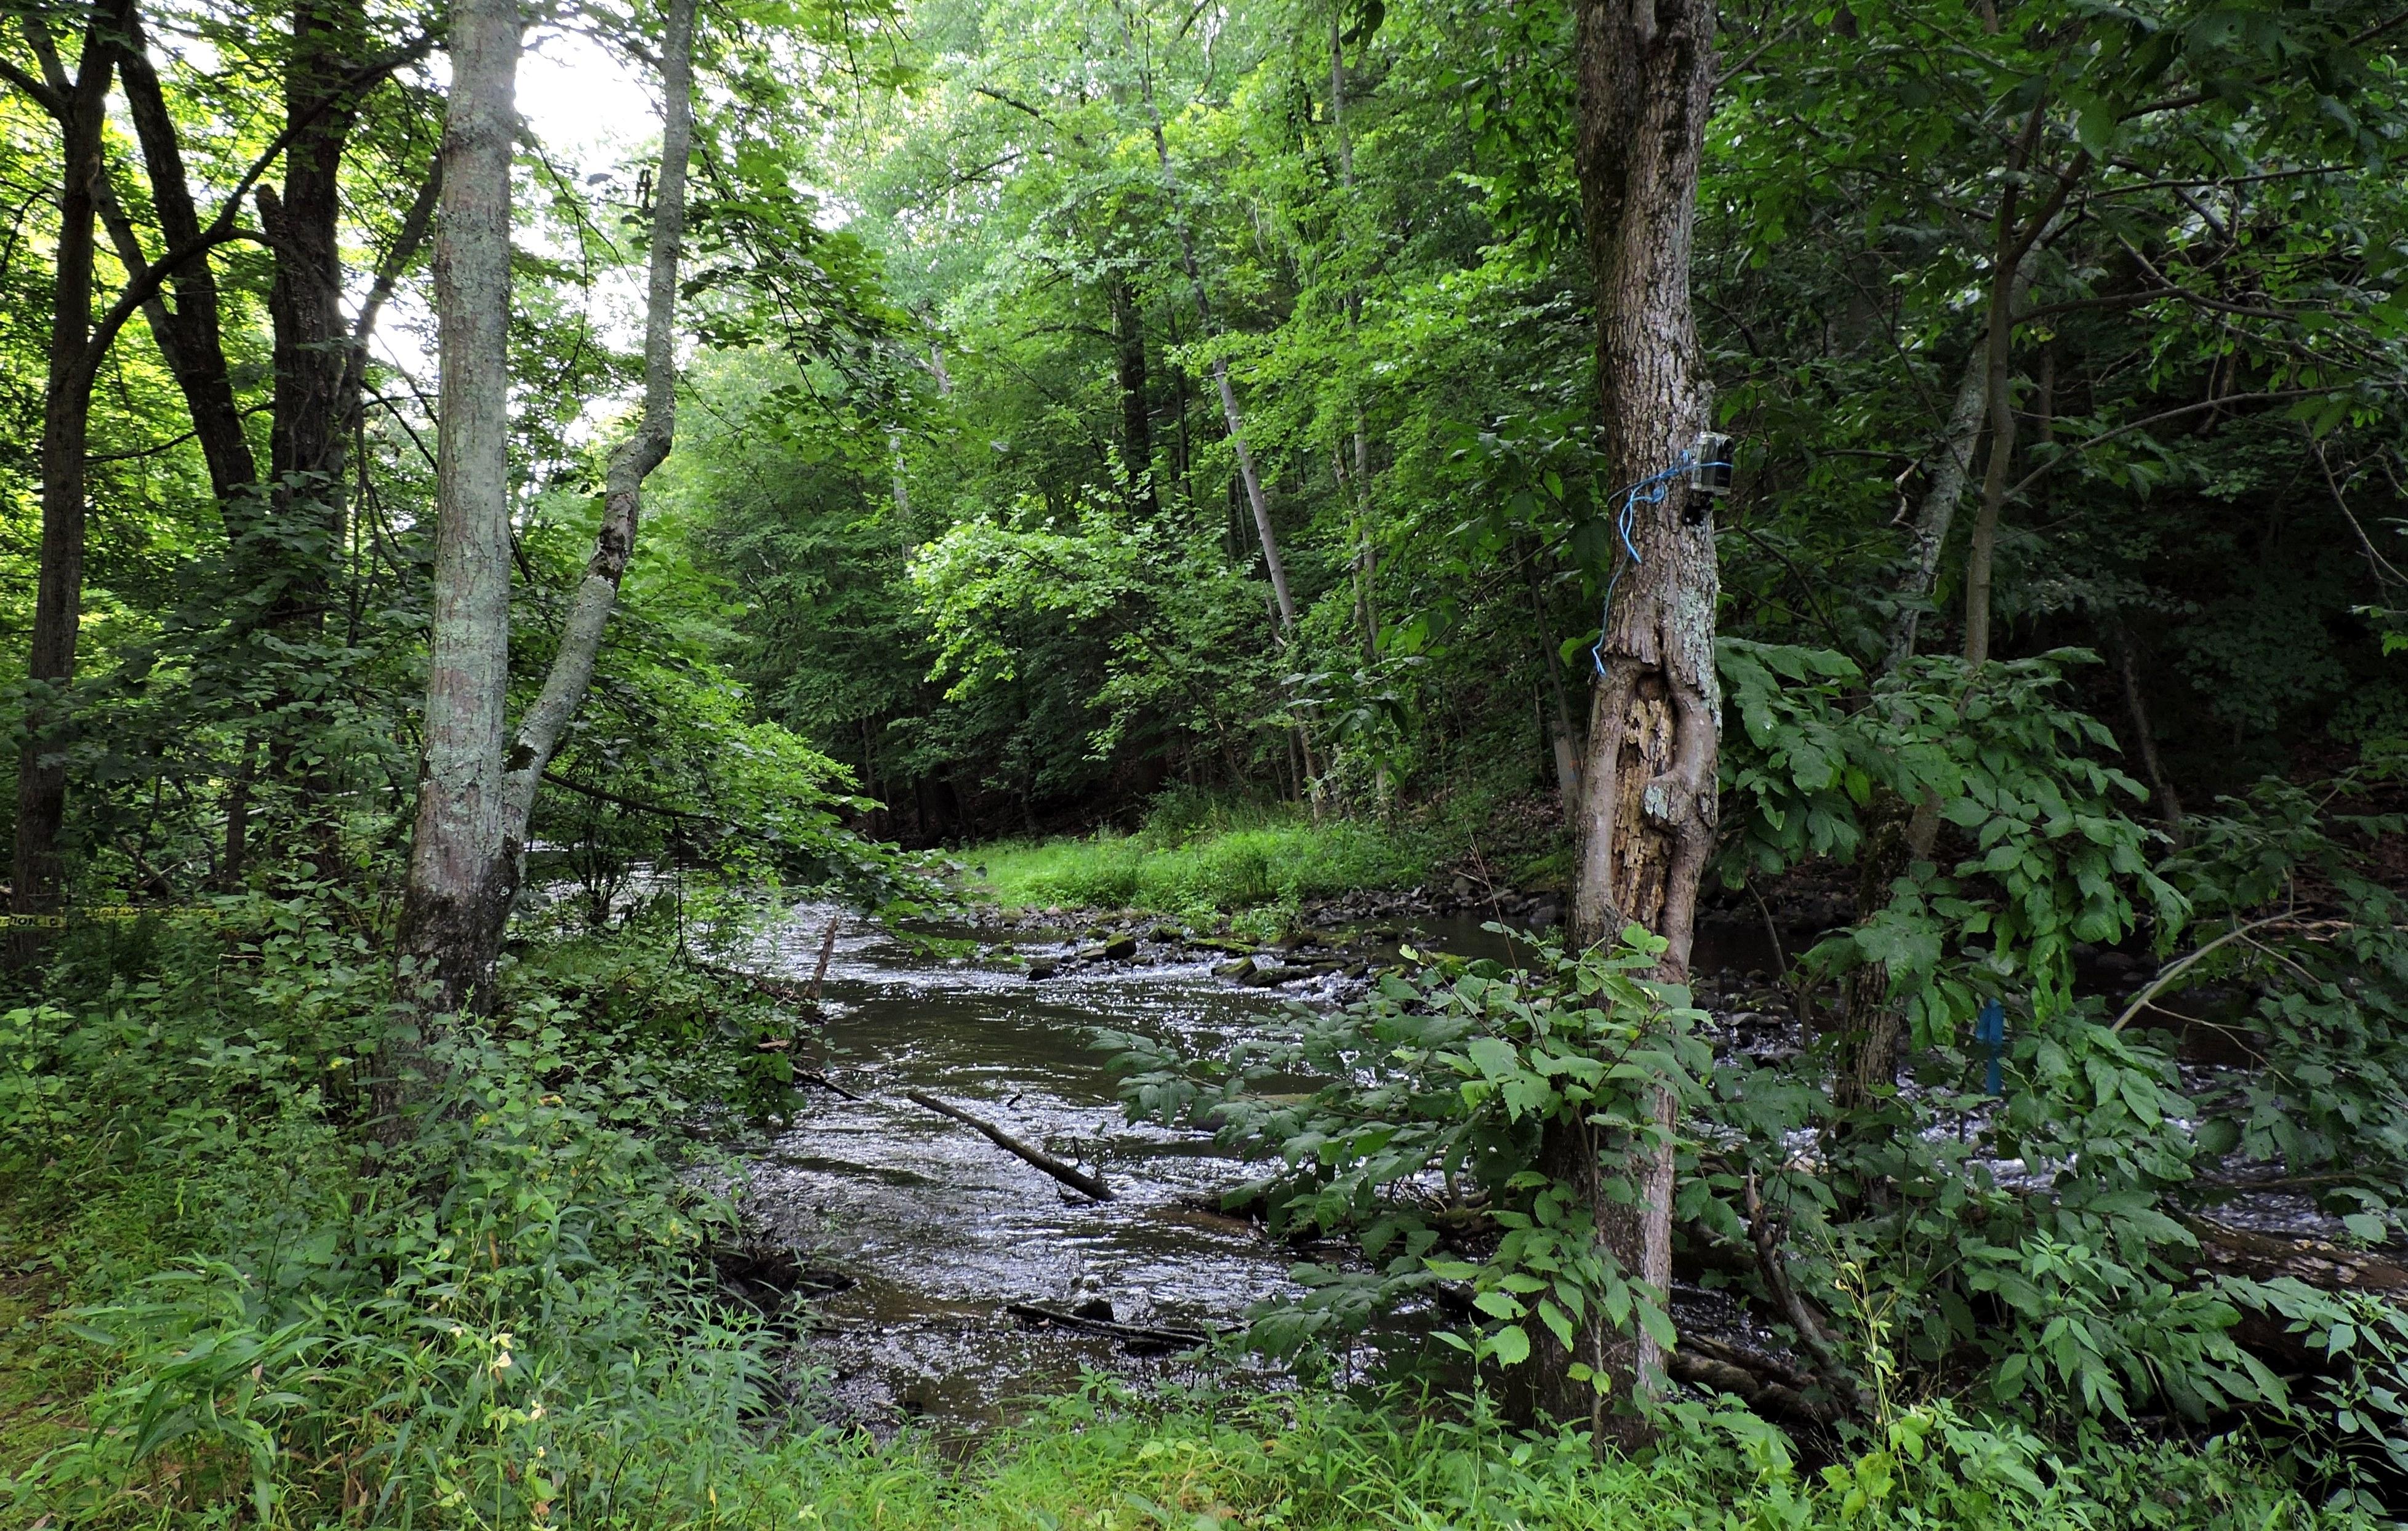 free flowing river - near carpenters dam - laura mcmillan